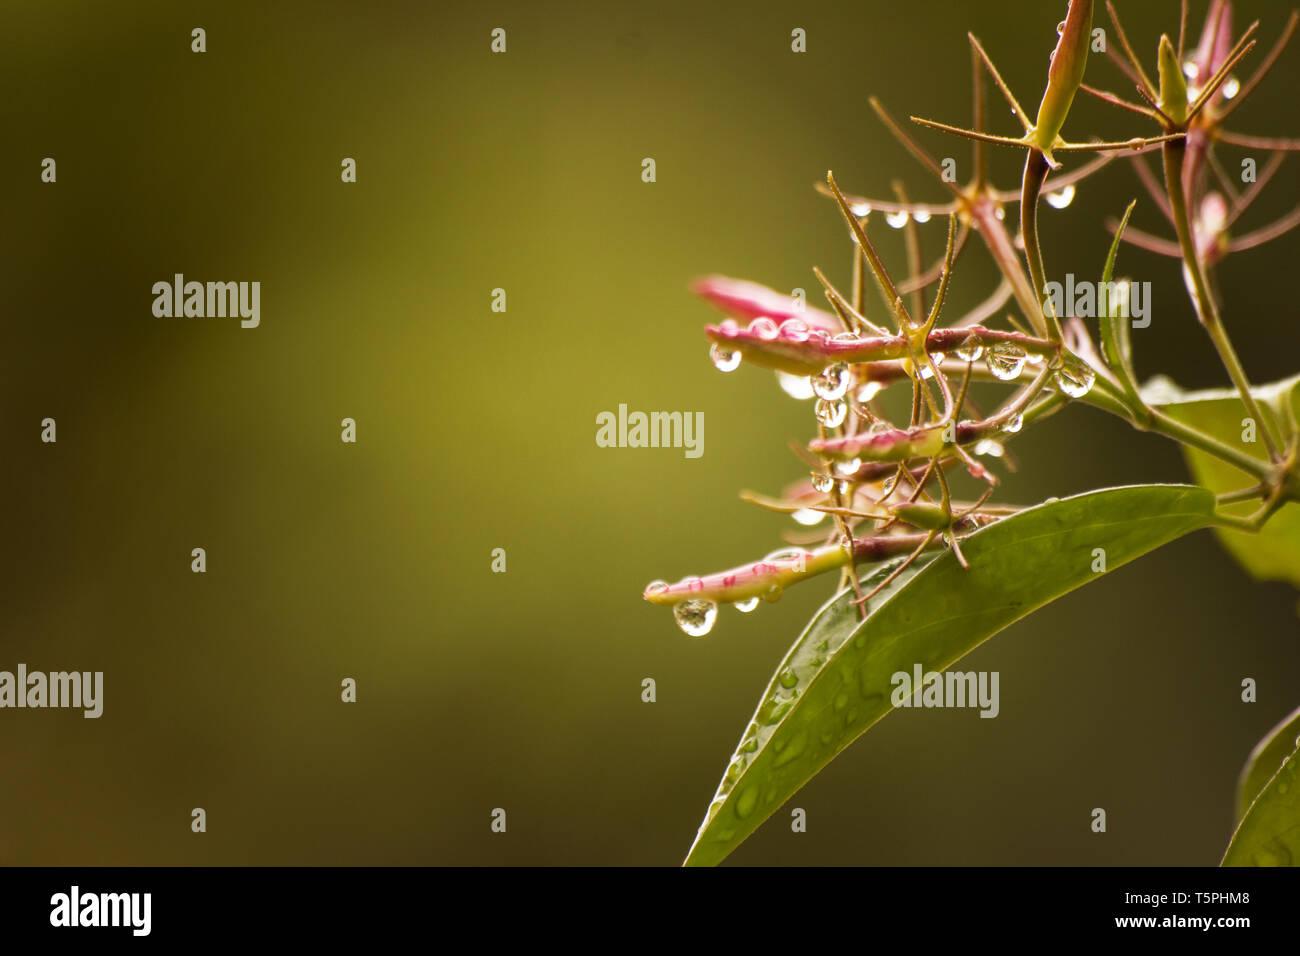 Budding jasmine plant with rain drops on natural background - Stock Image